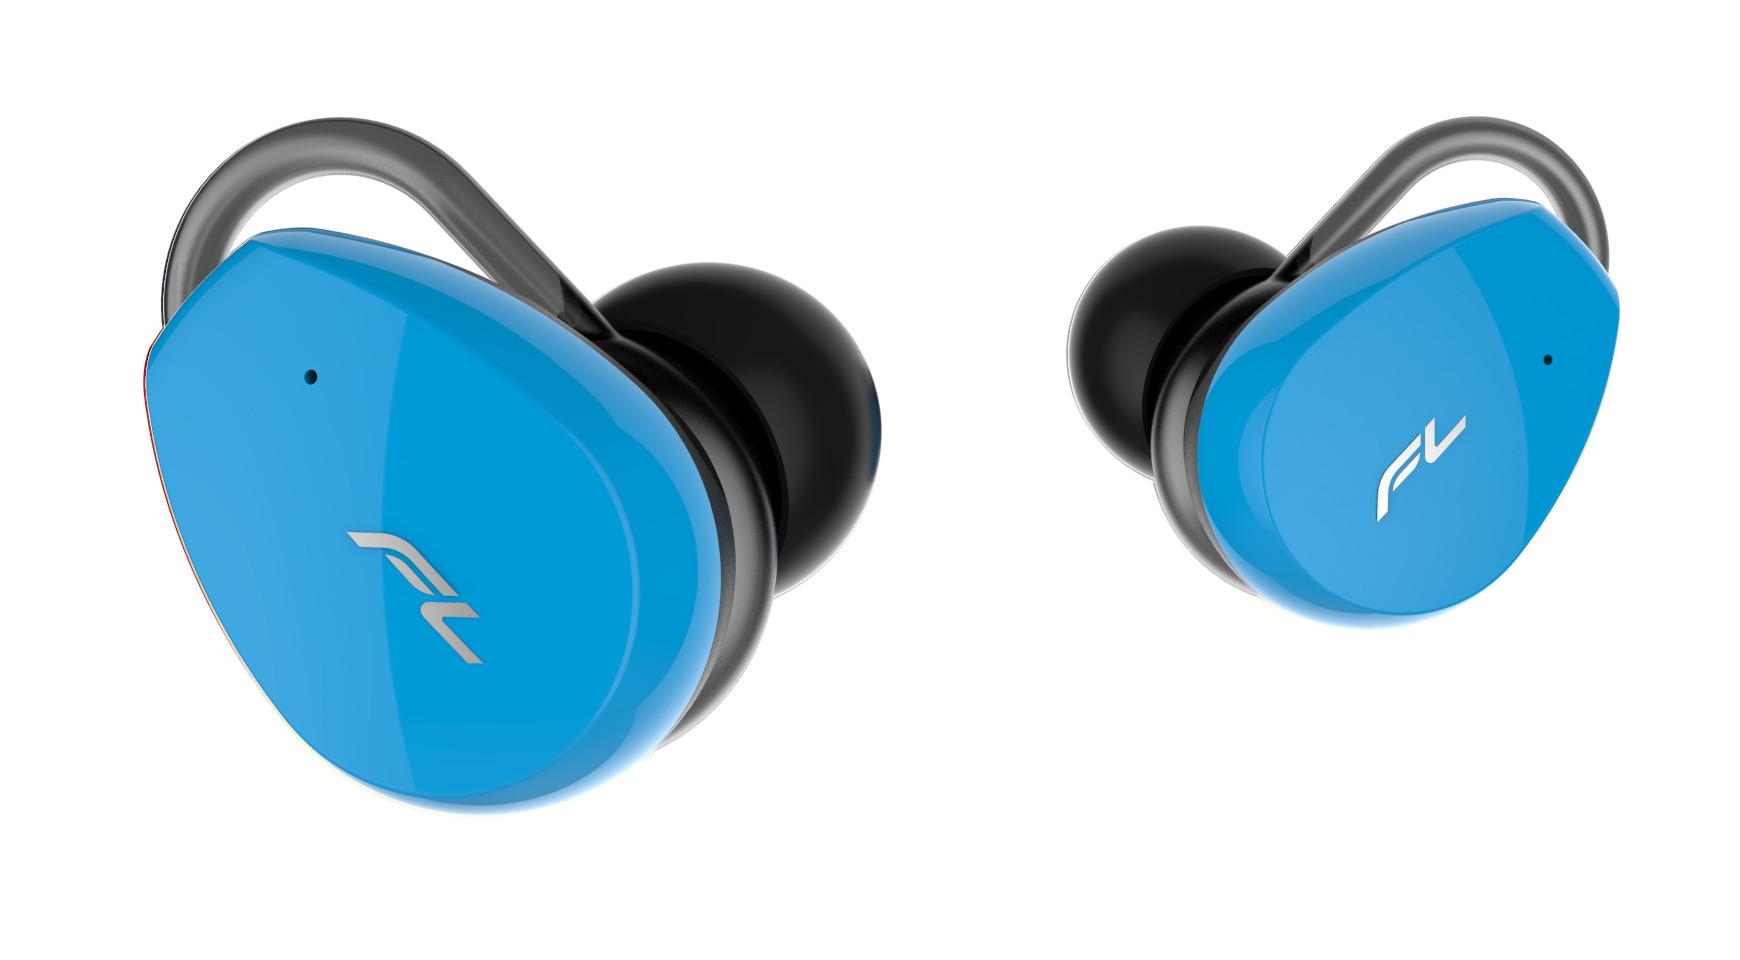 XR8 EARPHONES-MAIN SHOT-BLUE.jpg